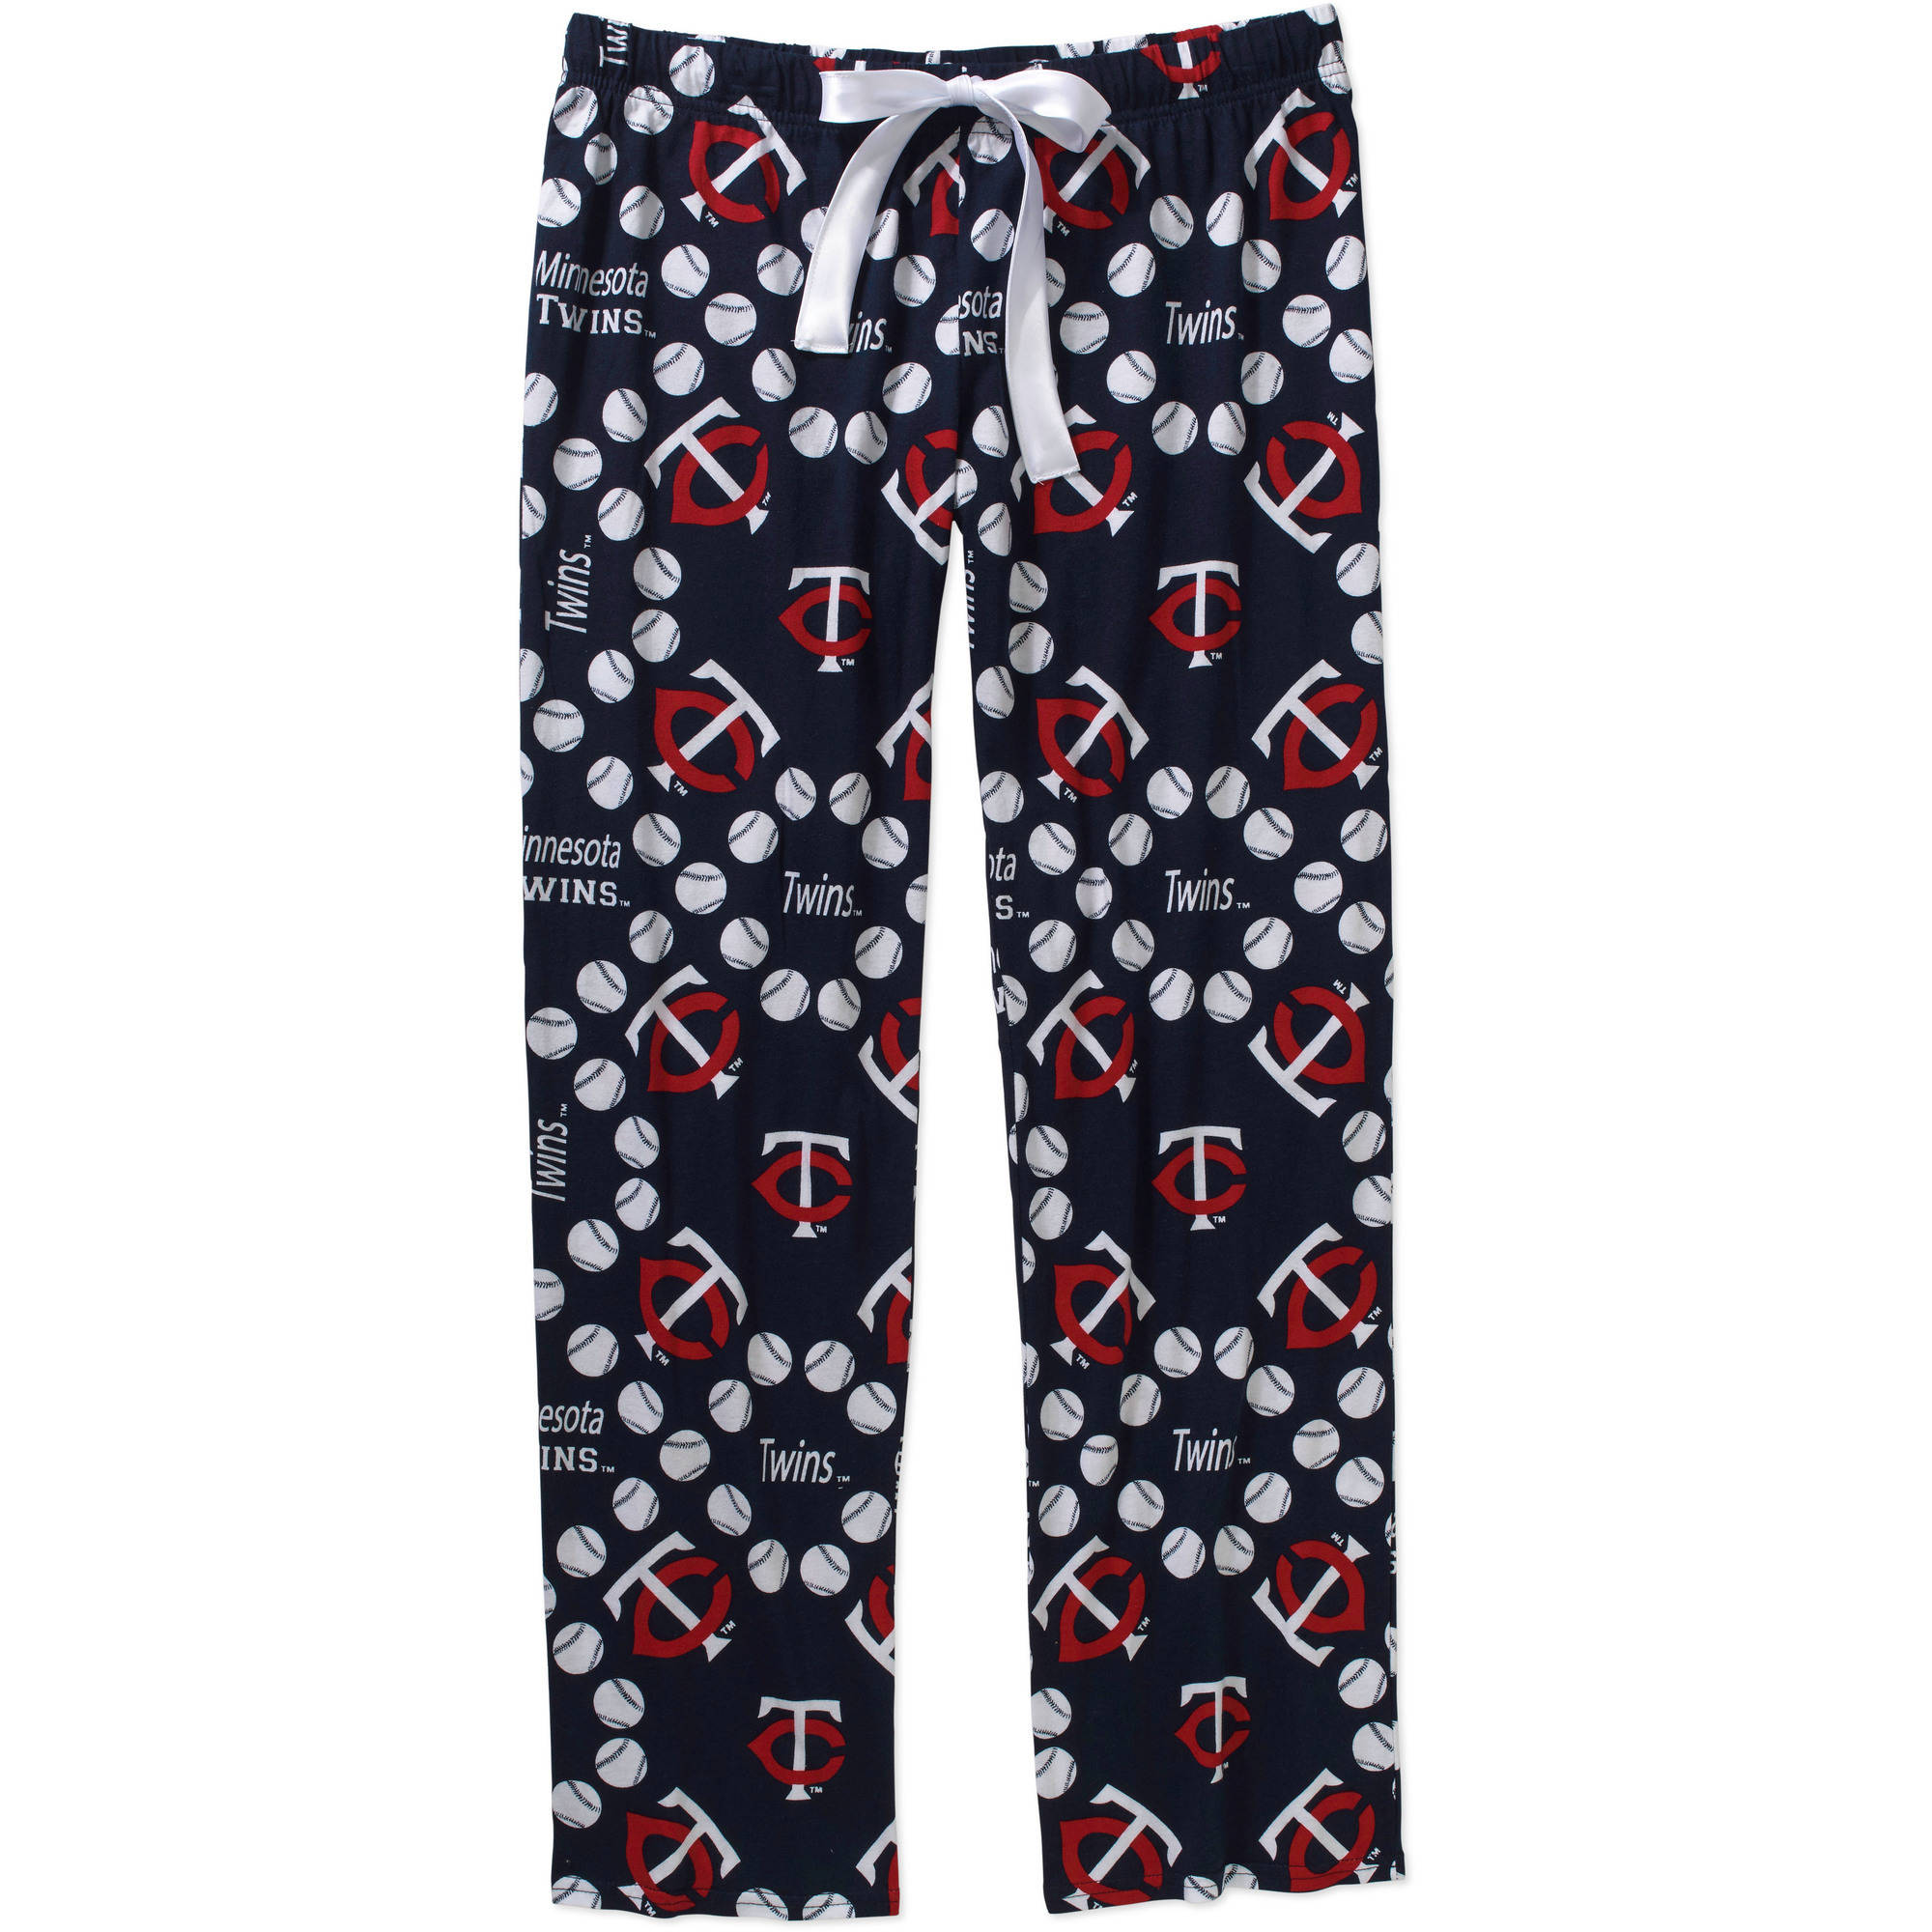 MLB Women's Minnesota Twins Knit Sleep Pants